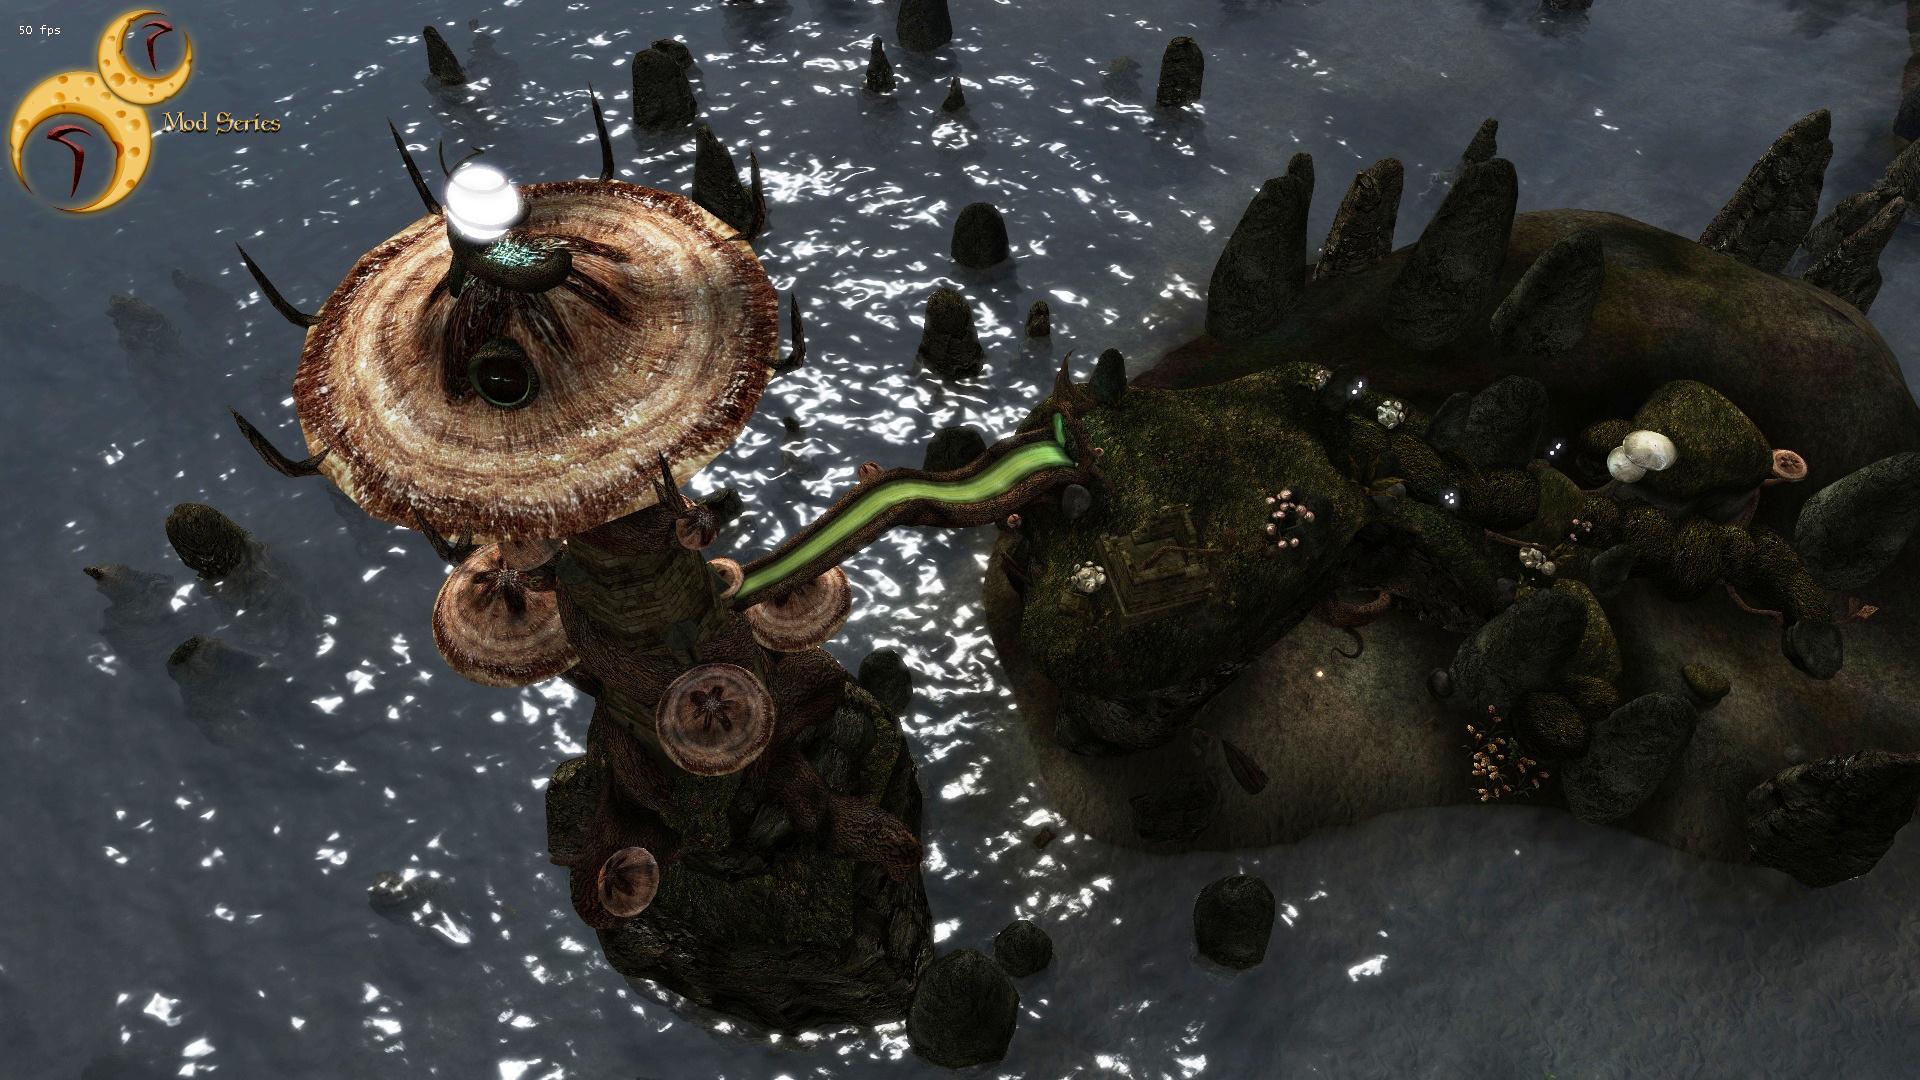 RR Mod Series - Telvanni Lighthouse Tel Vos - Elder Scrolls 3: Morrowind